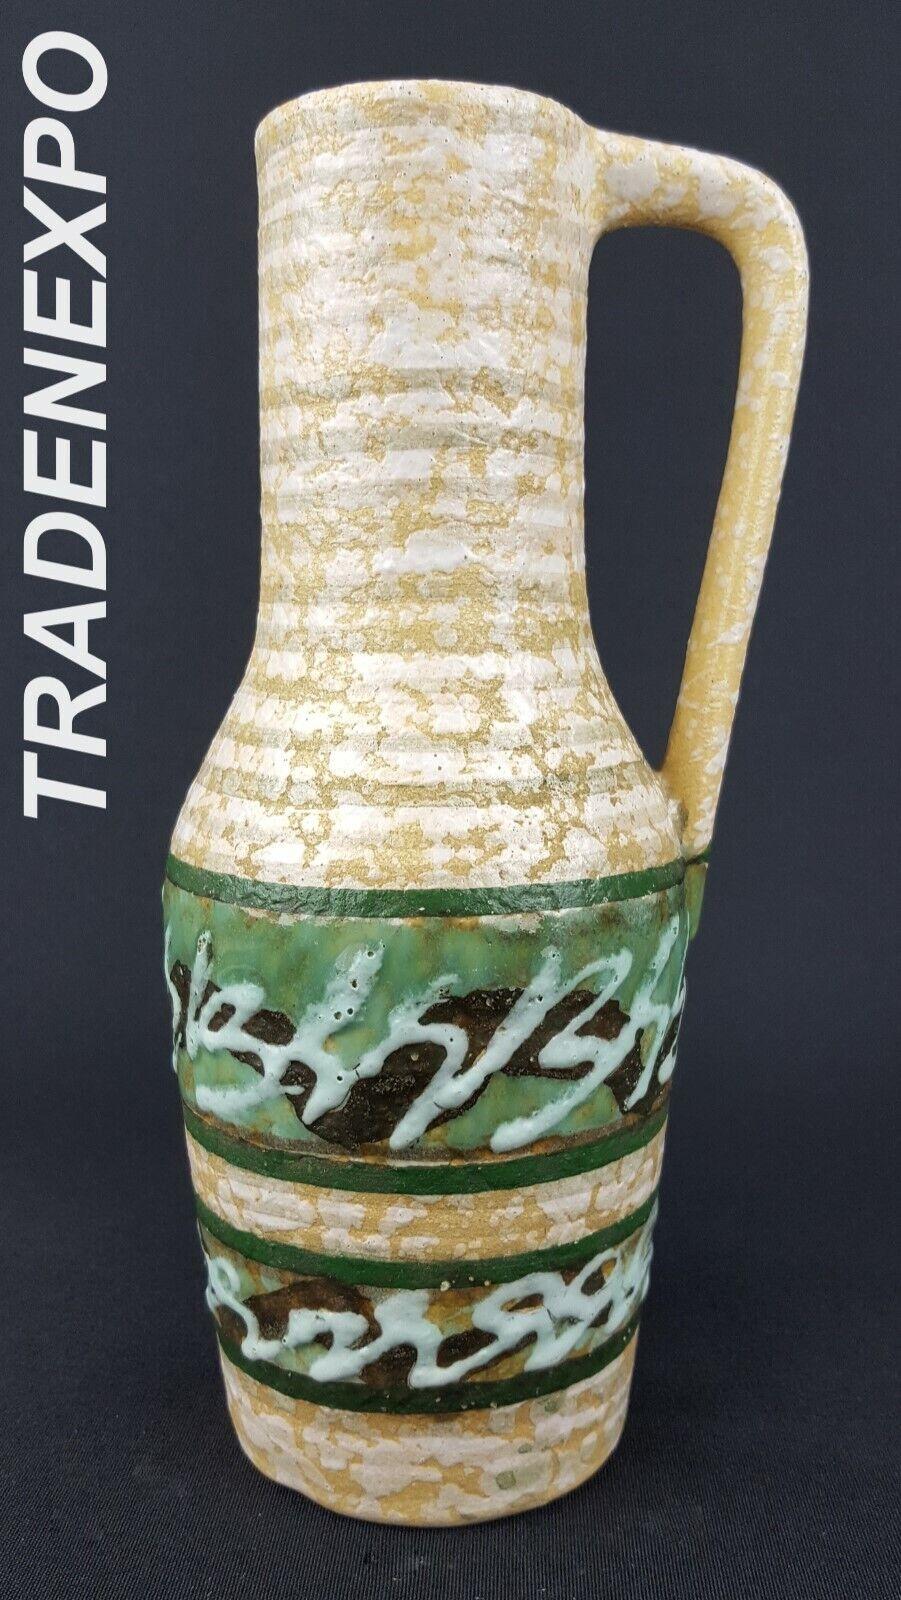 638-20 Vase Vintage West German Vase MCM Vase Pottery Pottery Collector, Minimalist Pottery Carstens Pottery MCM Carstens W German